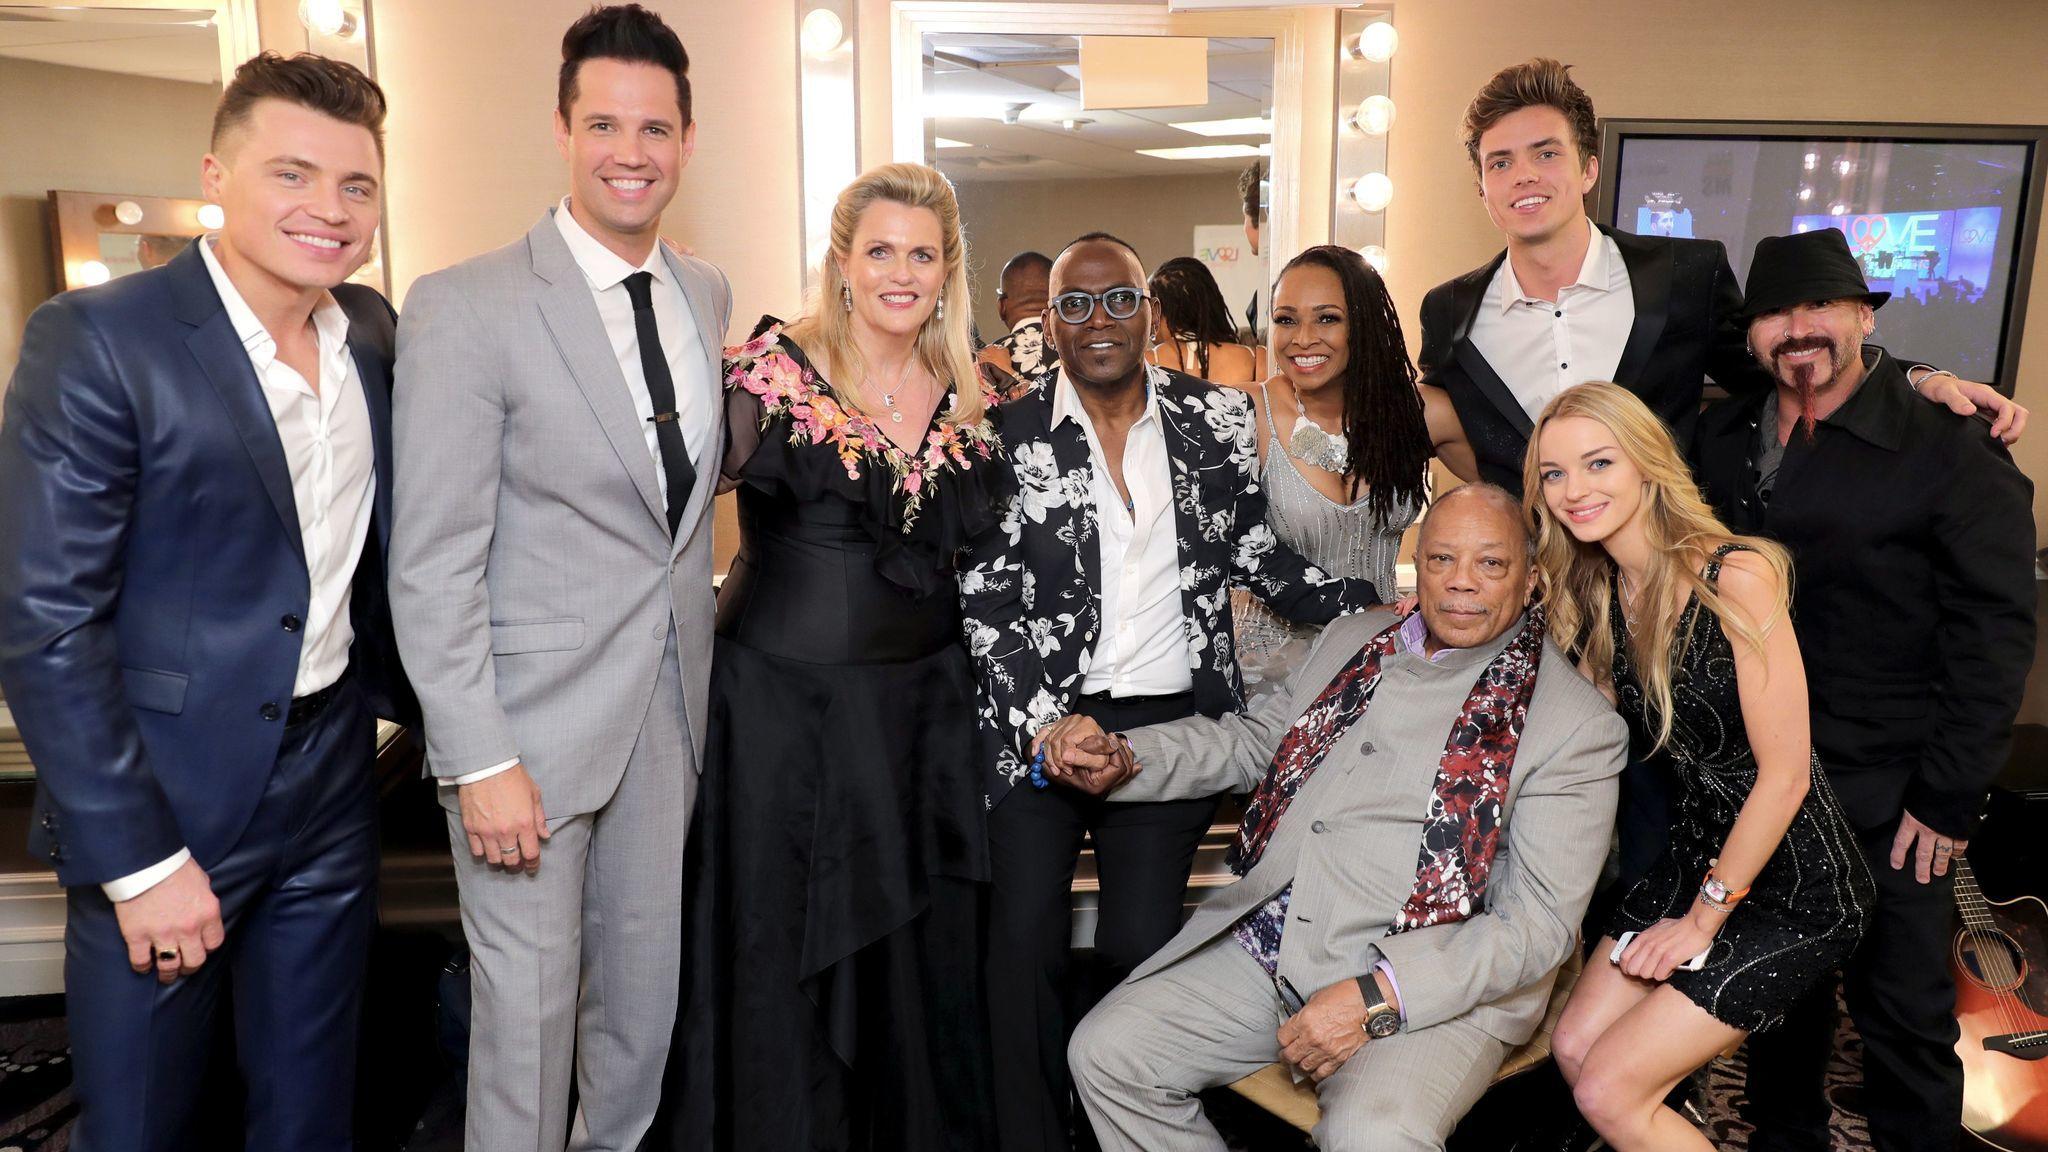 "From left, Shawn Hook, David Osmond, Nancy Davis, Randy Jackson, Siedah Garrett, Quincy Jones, Trevis Brendmoe, Lizzy Greene and Michael ""Fish"" Herring."